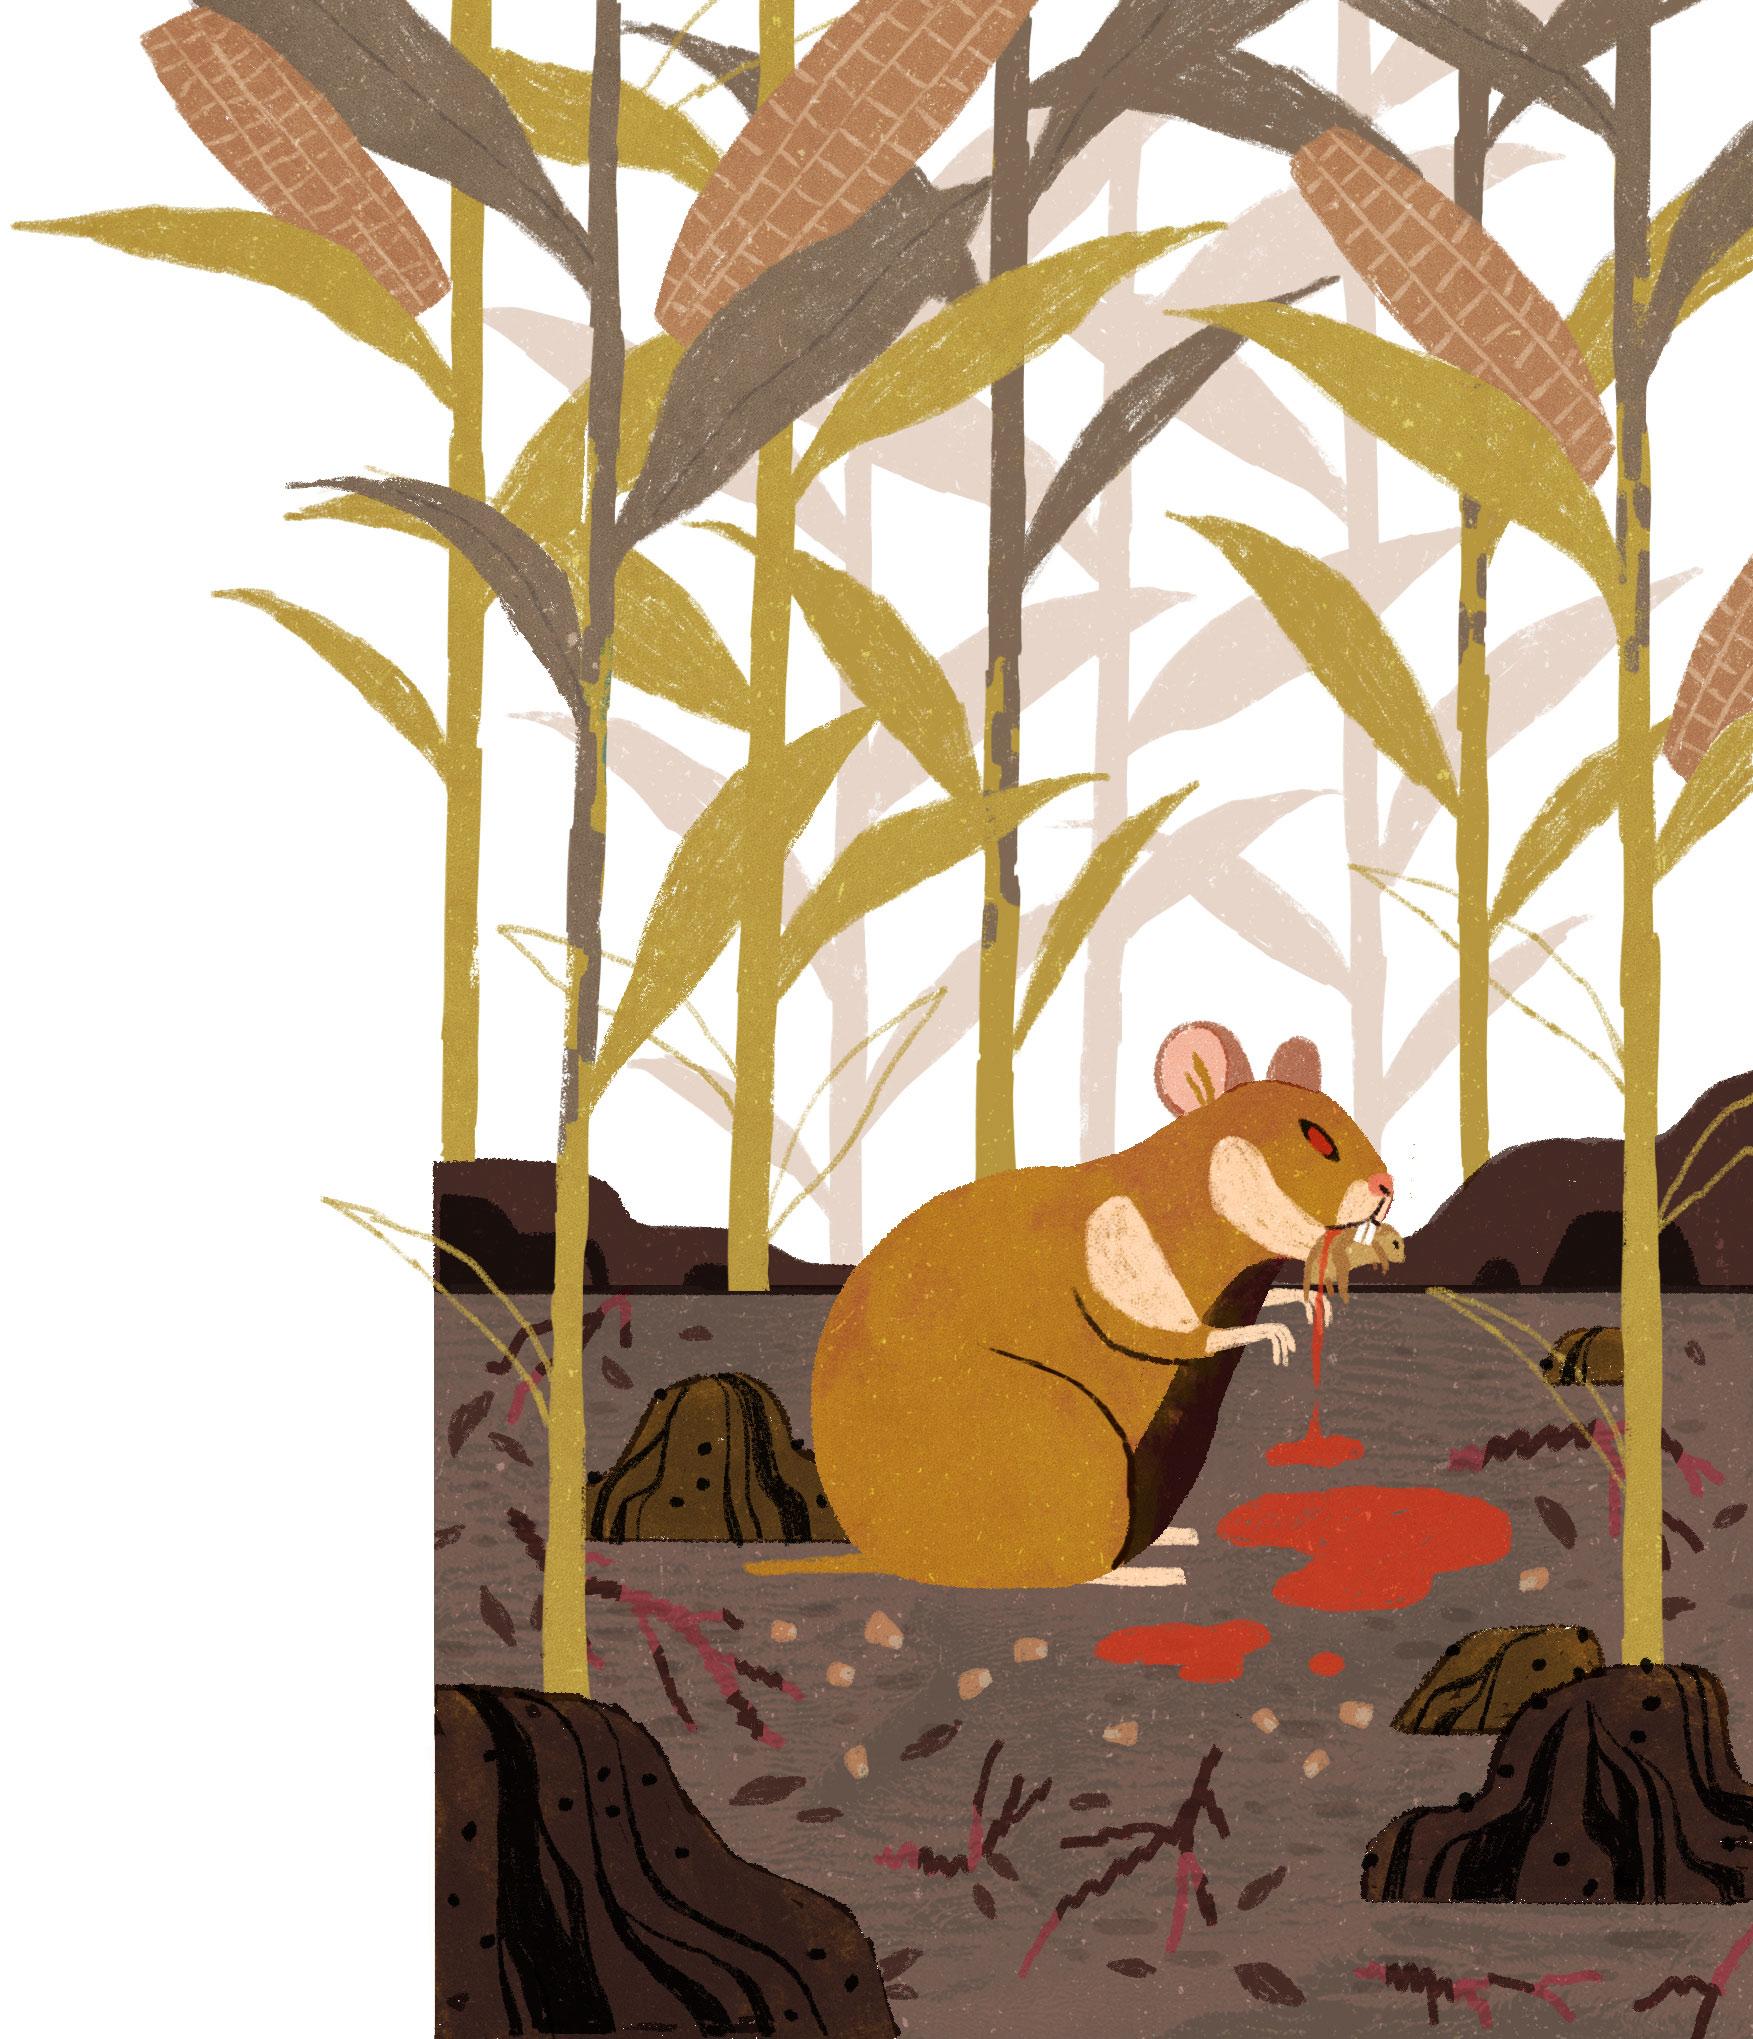 Corn-fed hamsters